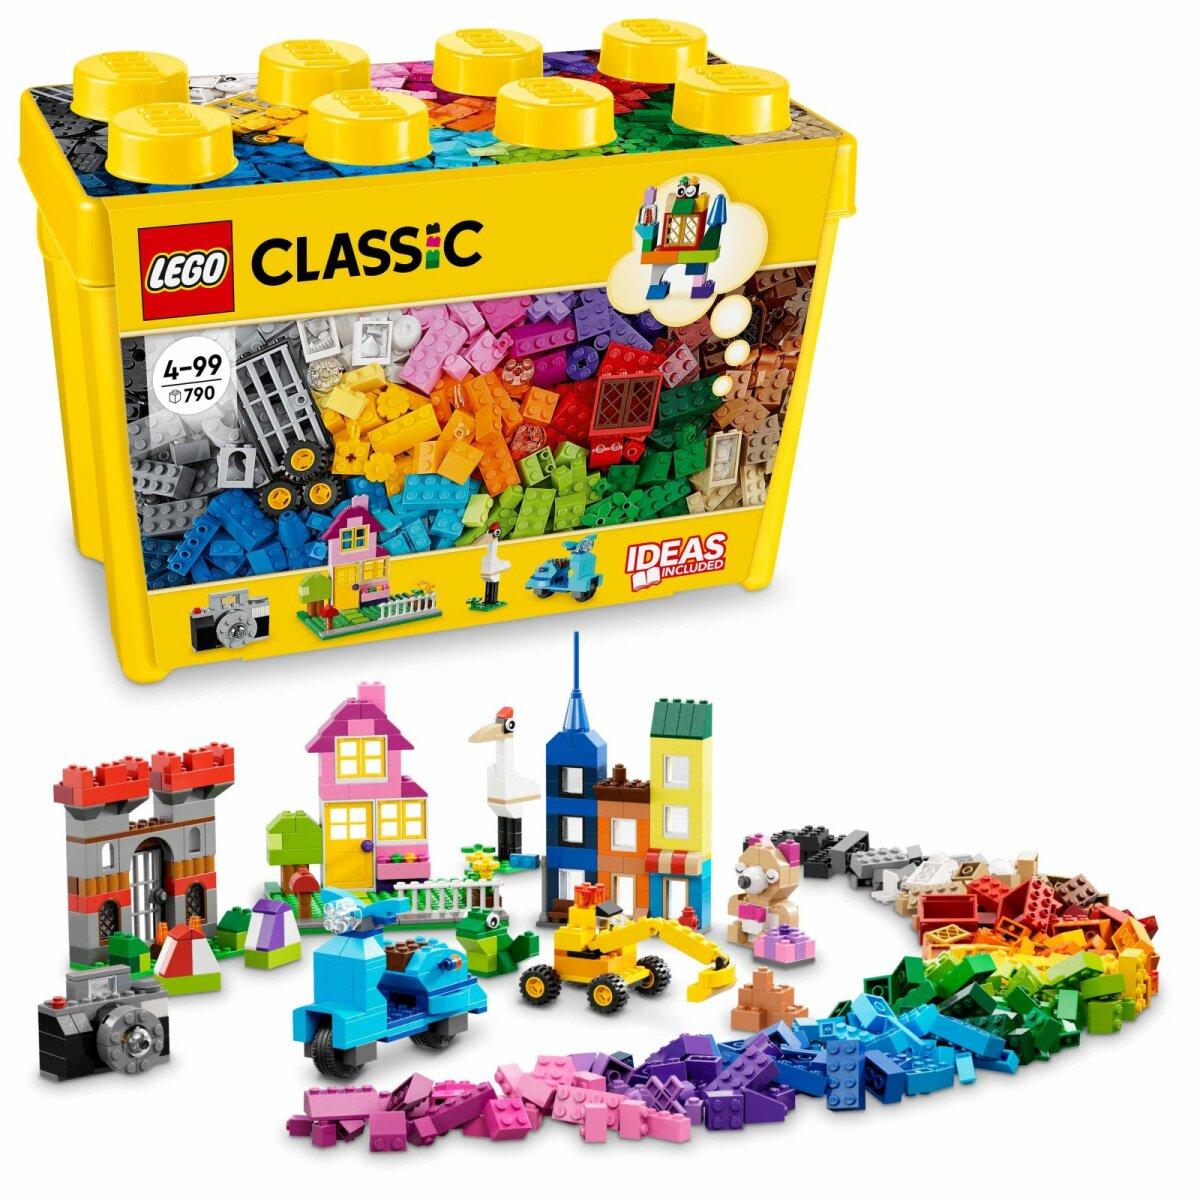 LEGO Classic - Große Bausteine-Box (10698), 39,27